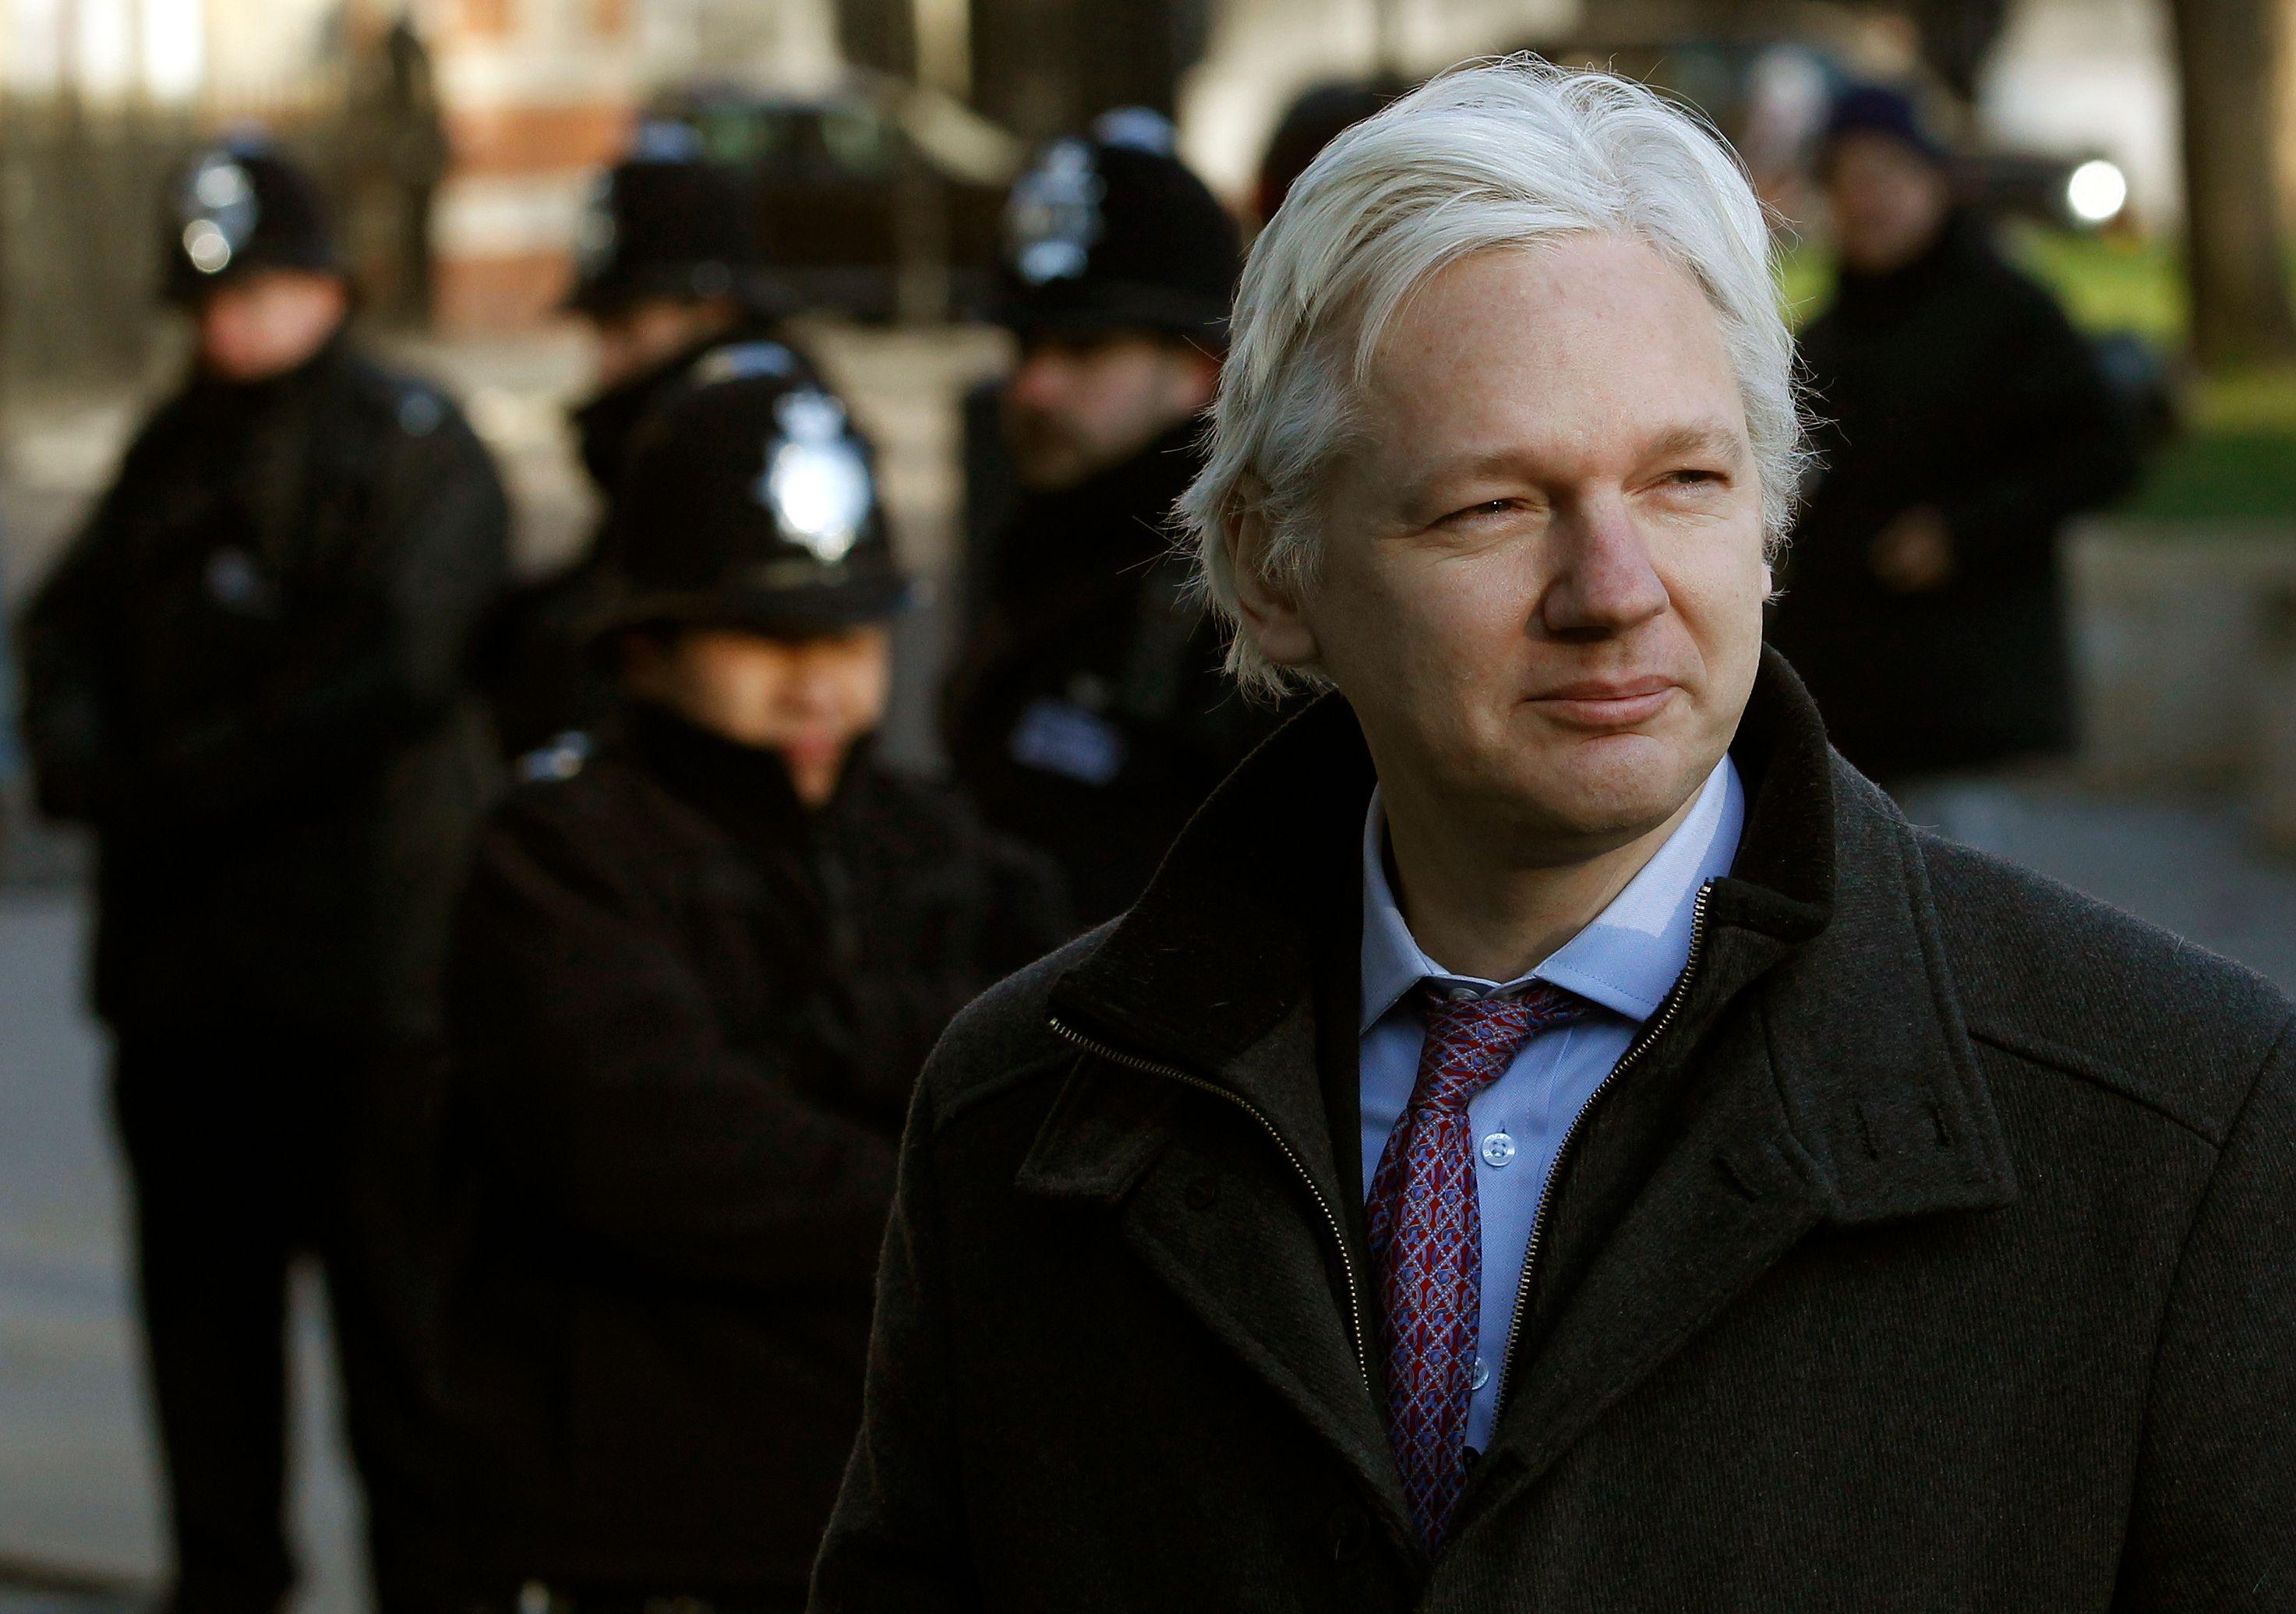 Rumeur : Hillary Clinton aurait voulu faire tuer Julian Assange